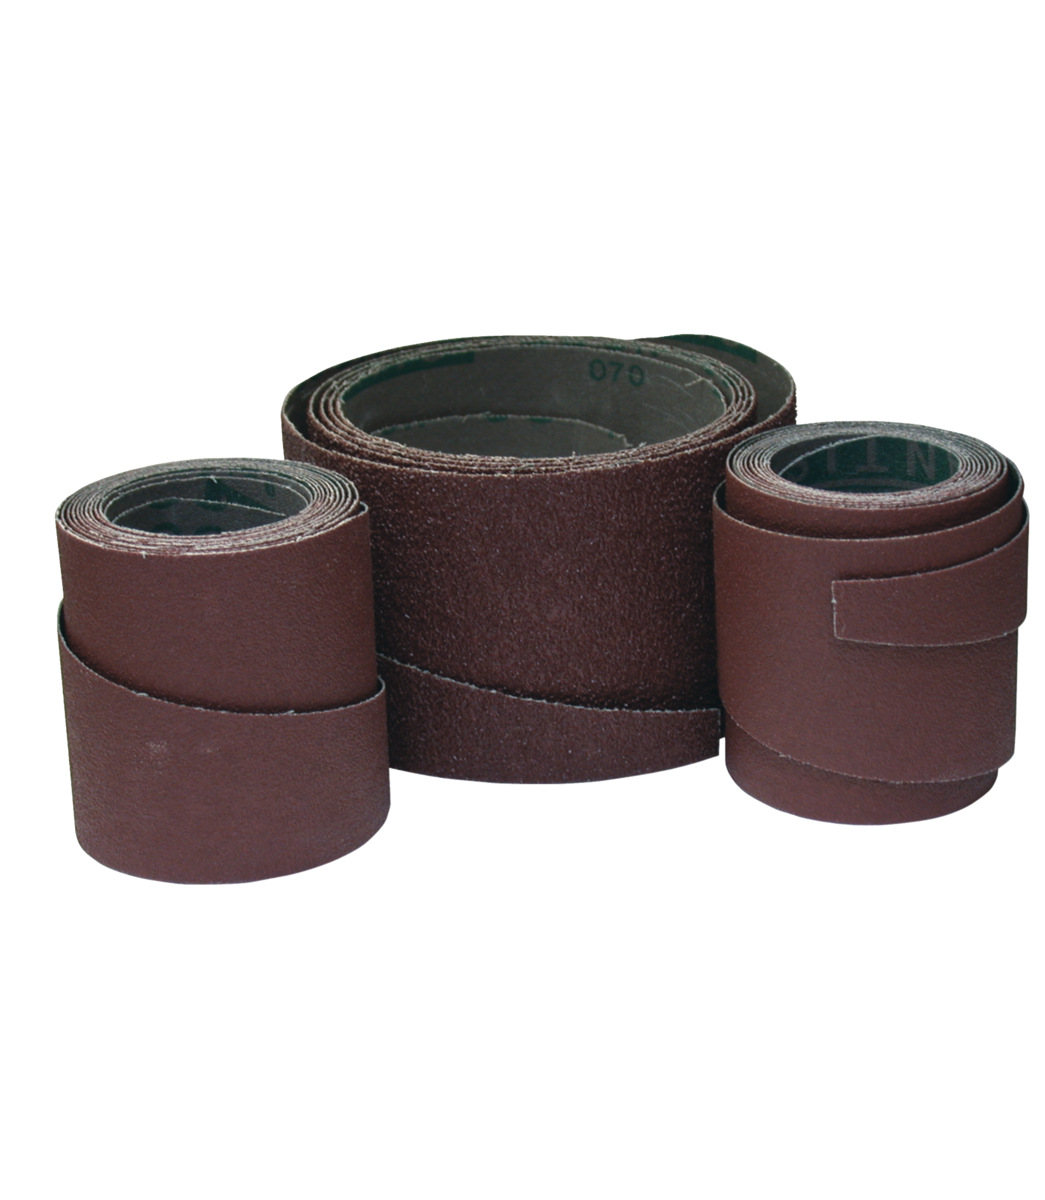 PM2244 Precut Abrasive, 180 Grit - 3 Pack